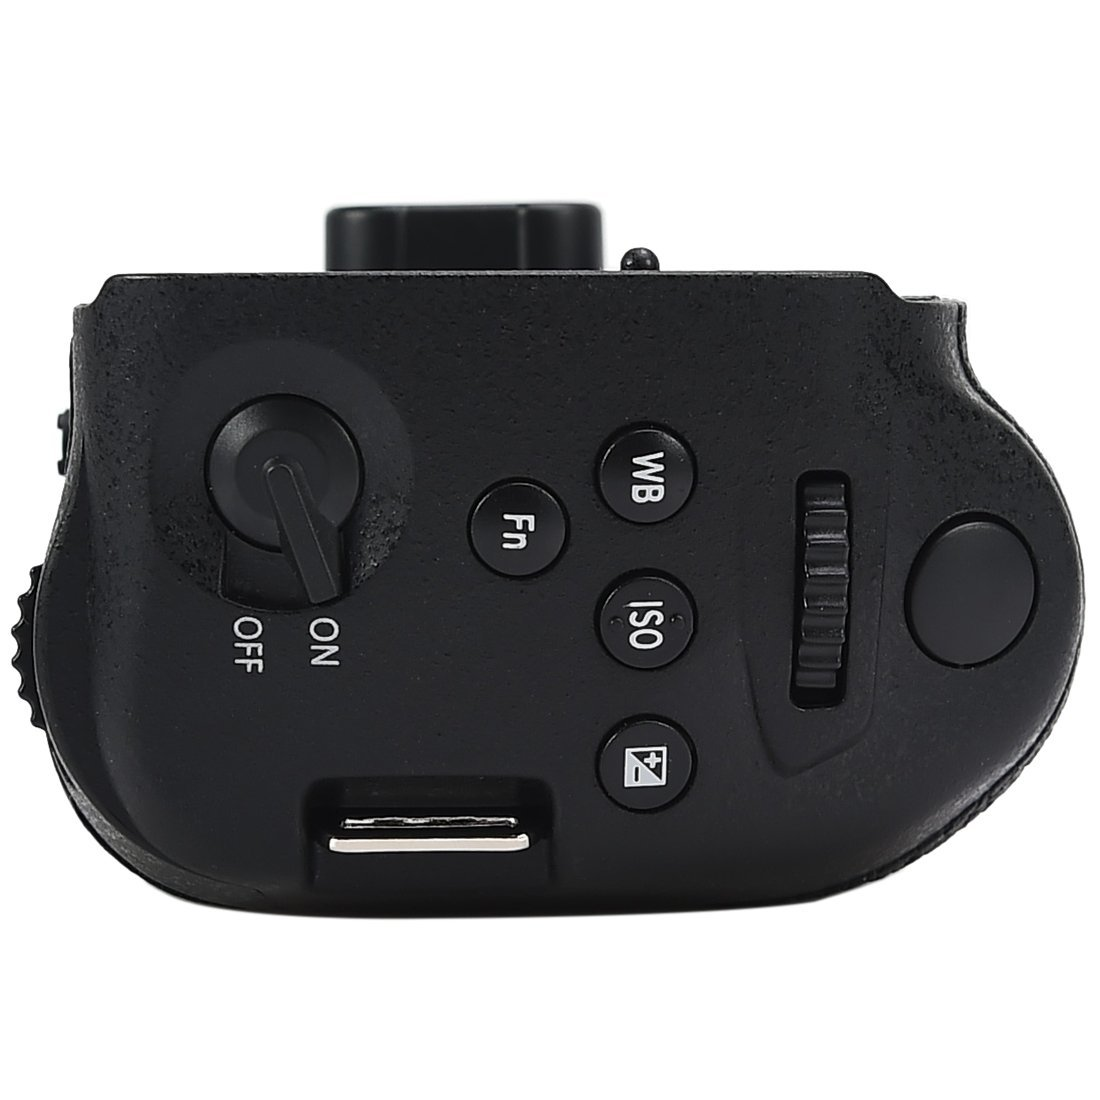 Kit Battery Grip DMW-BGGH5 para Panasonic DMC-GH5 + 2 baterias